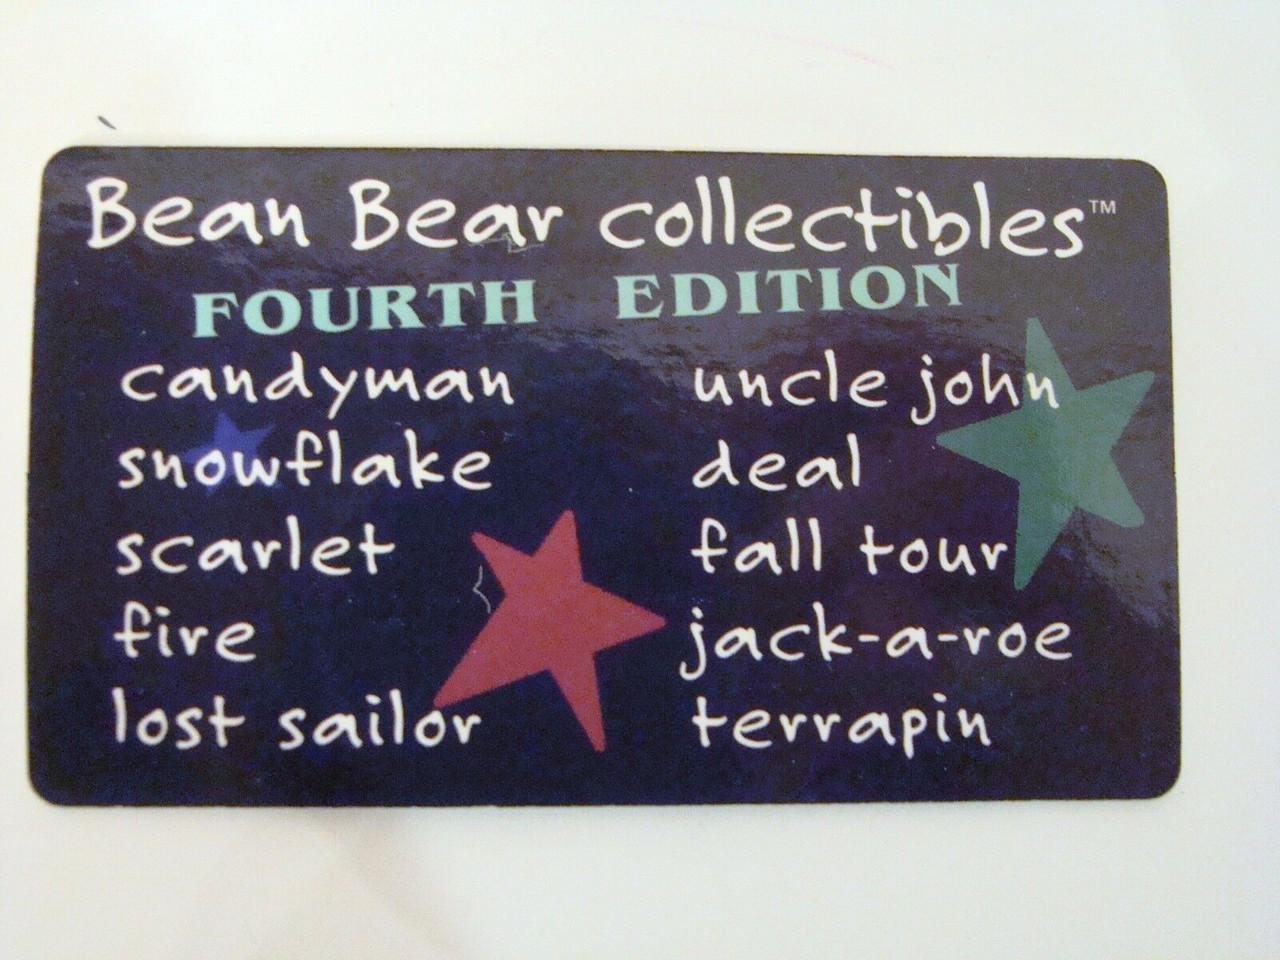 Grateful Dead Bean Bear Laminate Collector Card 8 cards 2,4,5,6,7,10,12,13 (LB-CardSet8)